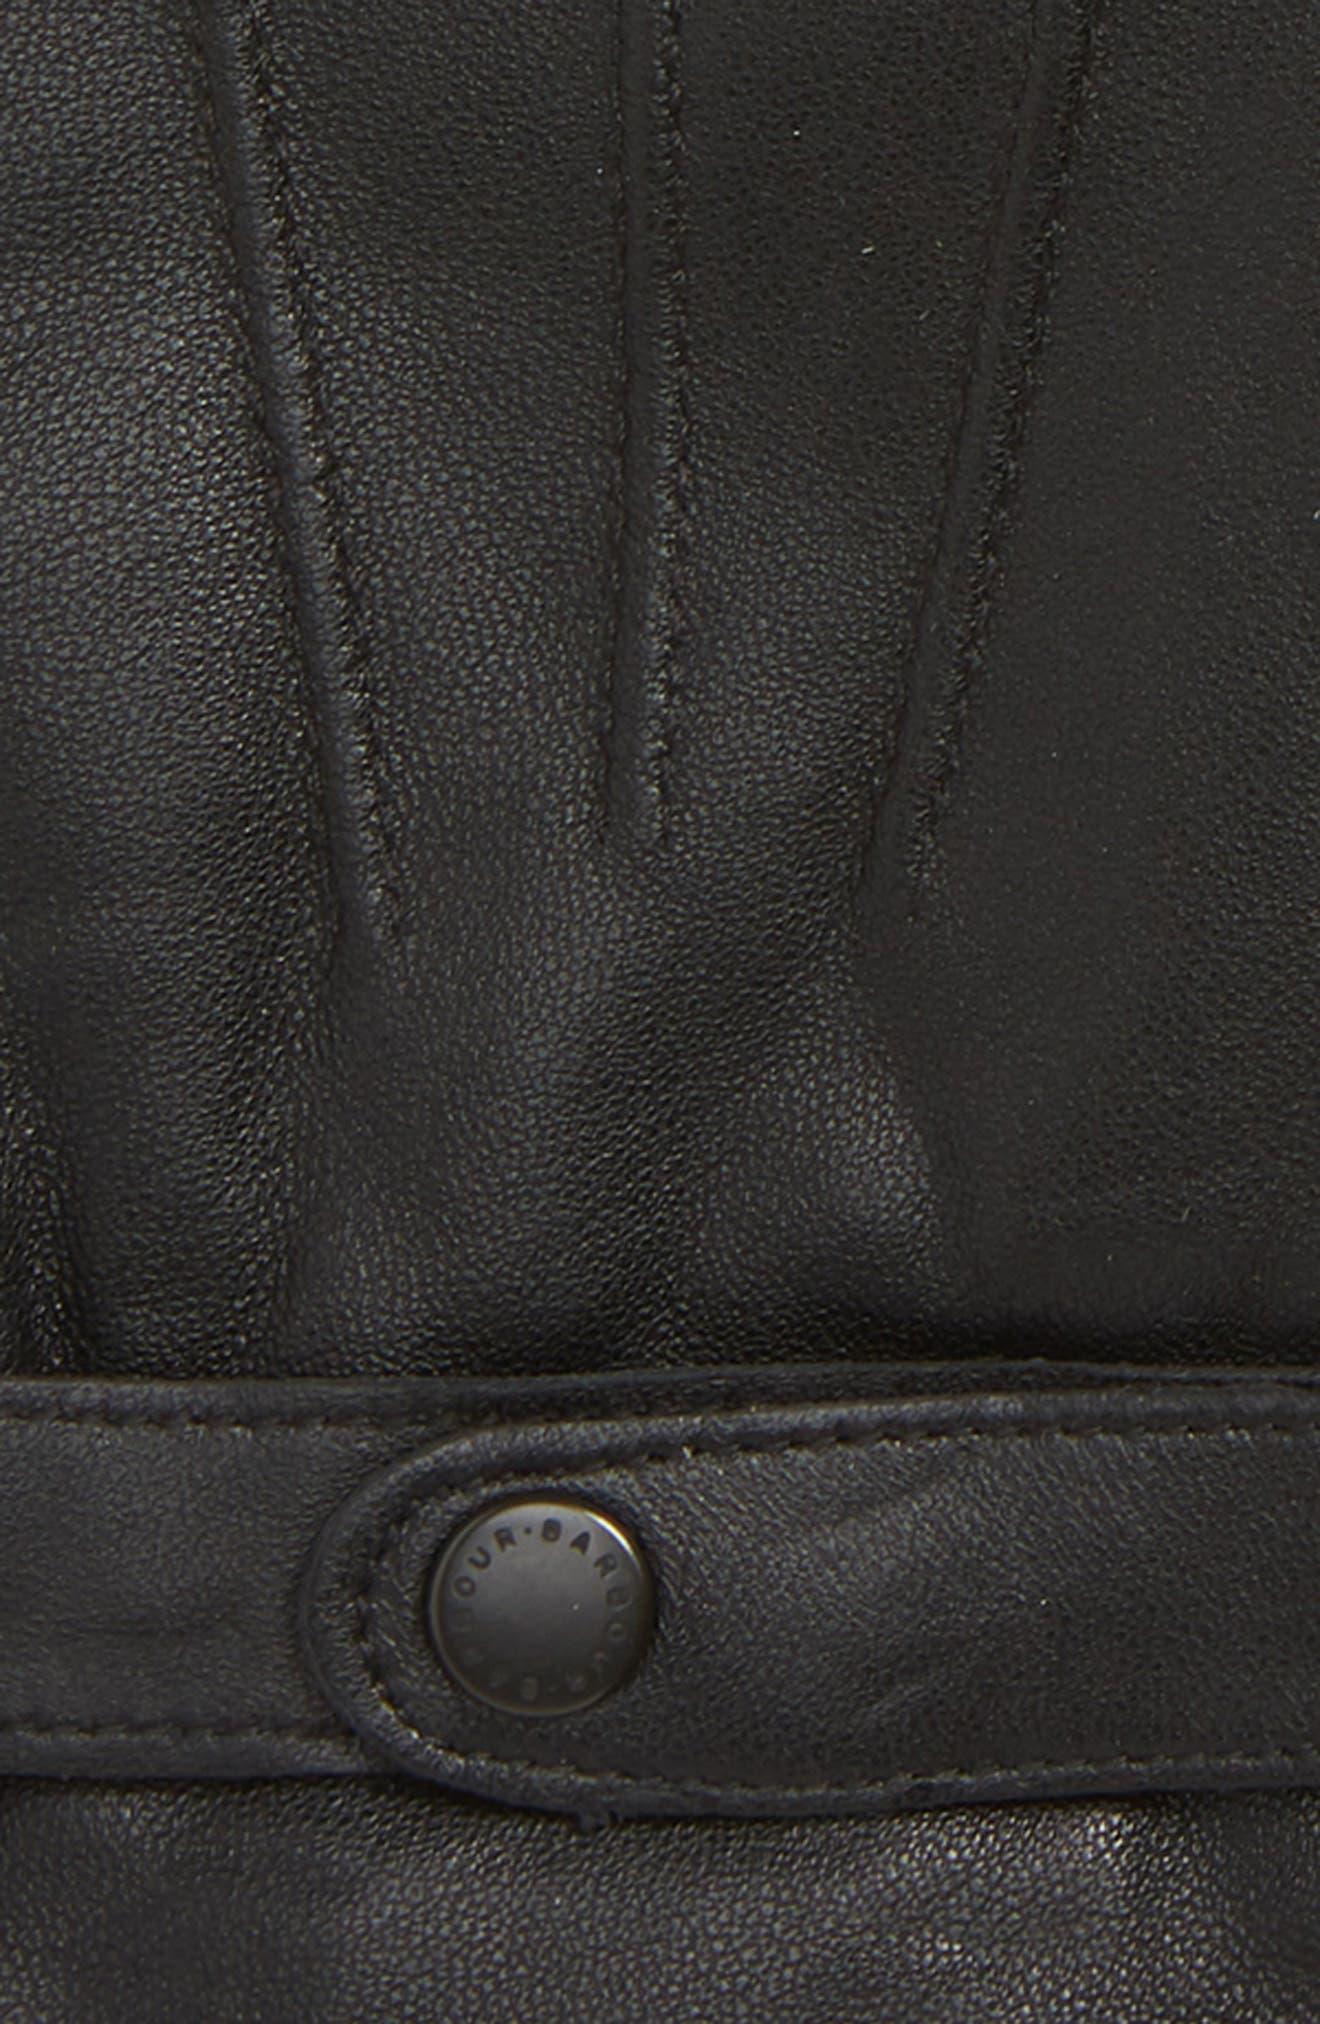 Burnished Leather Gloves,                             Alternate thumbnail 2, color,                             001